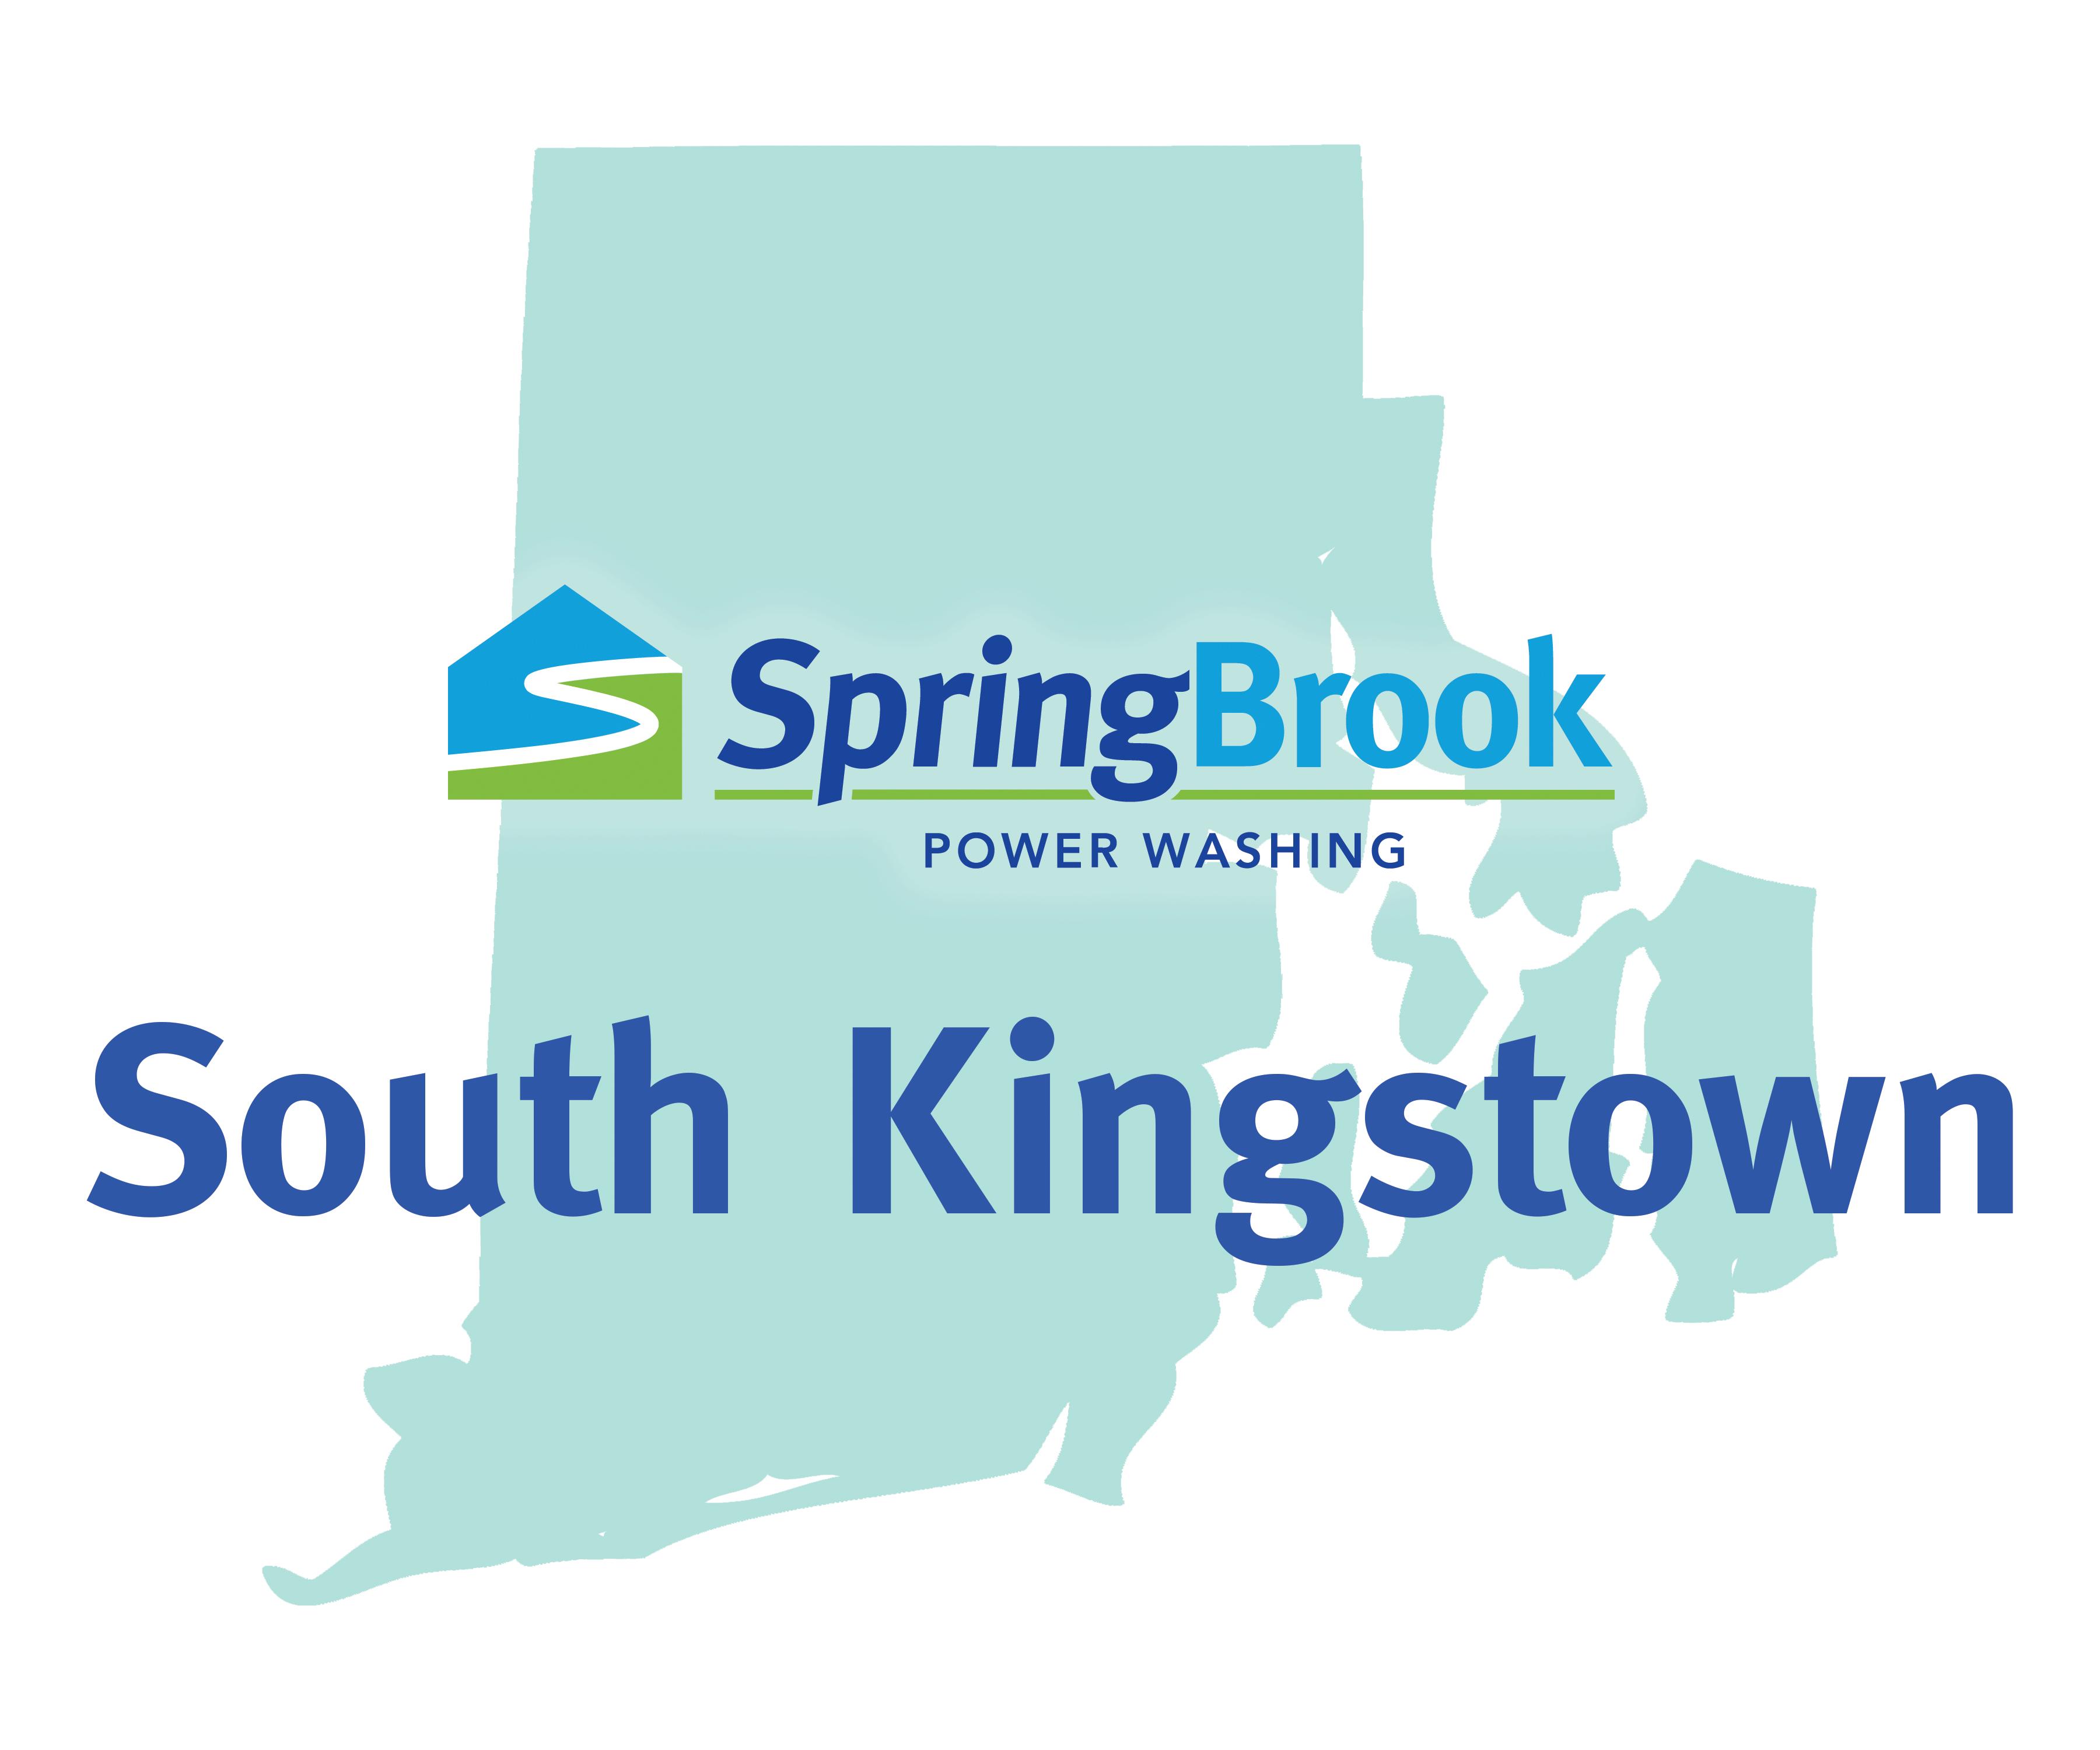 Springbrook Power Washing South Kingstown Rhode Island